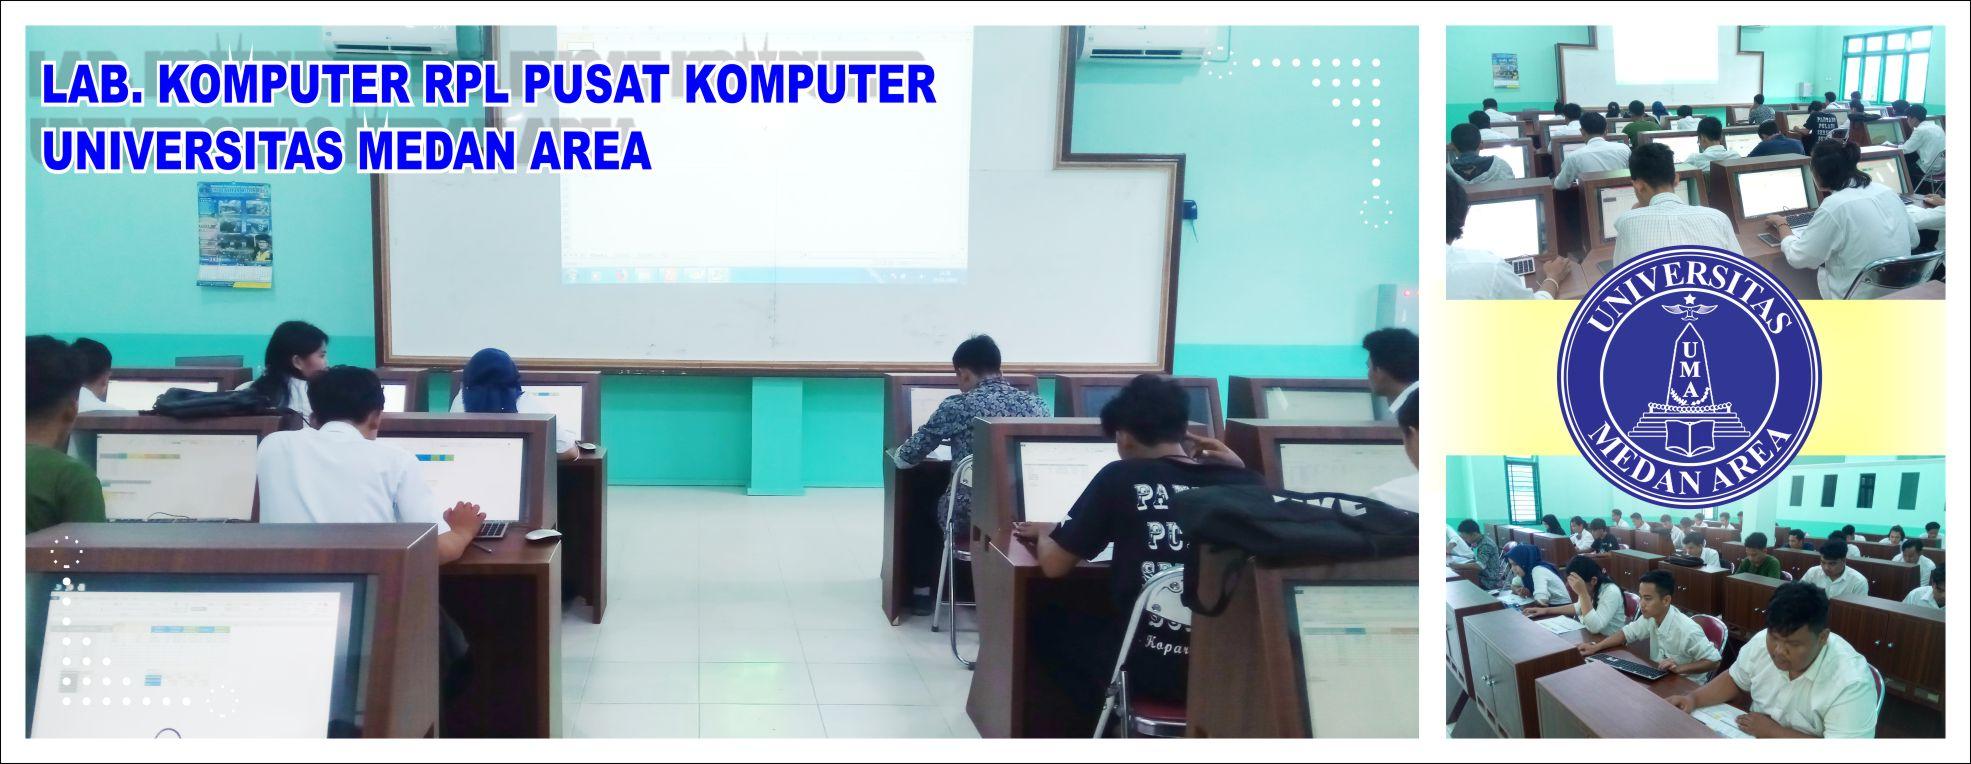 Lab. Komputer RPL